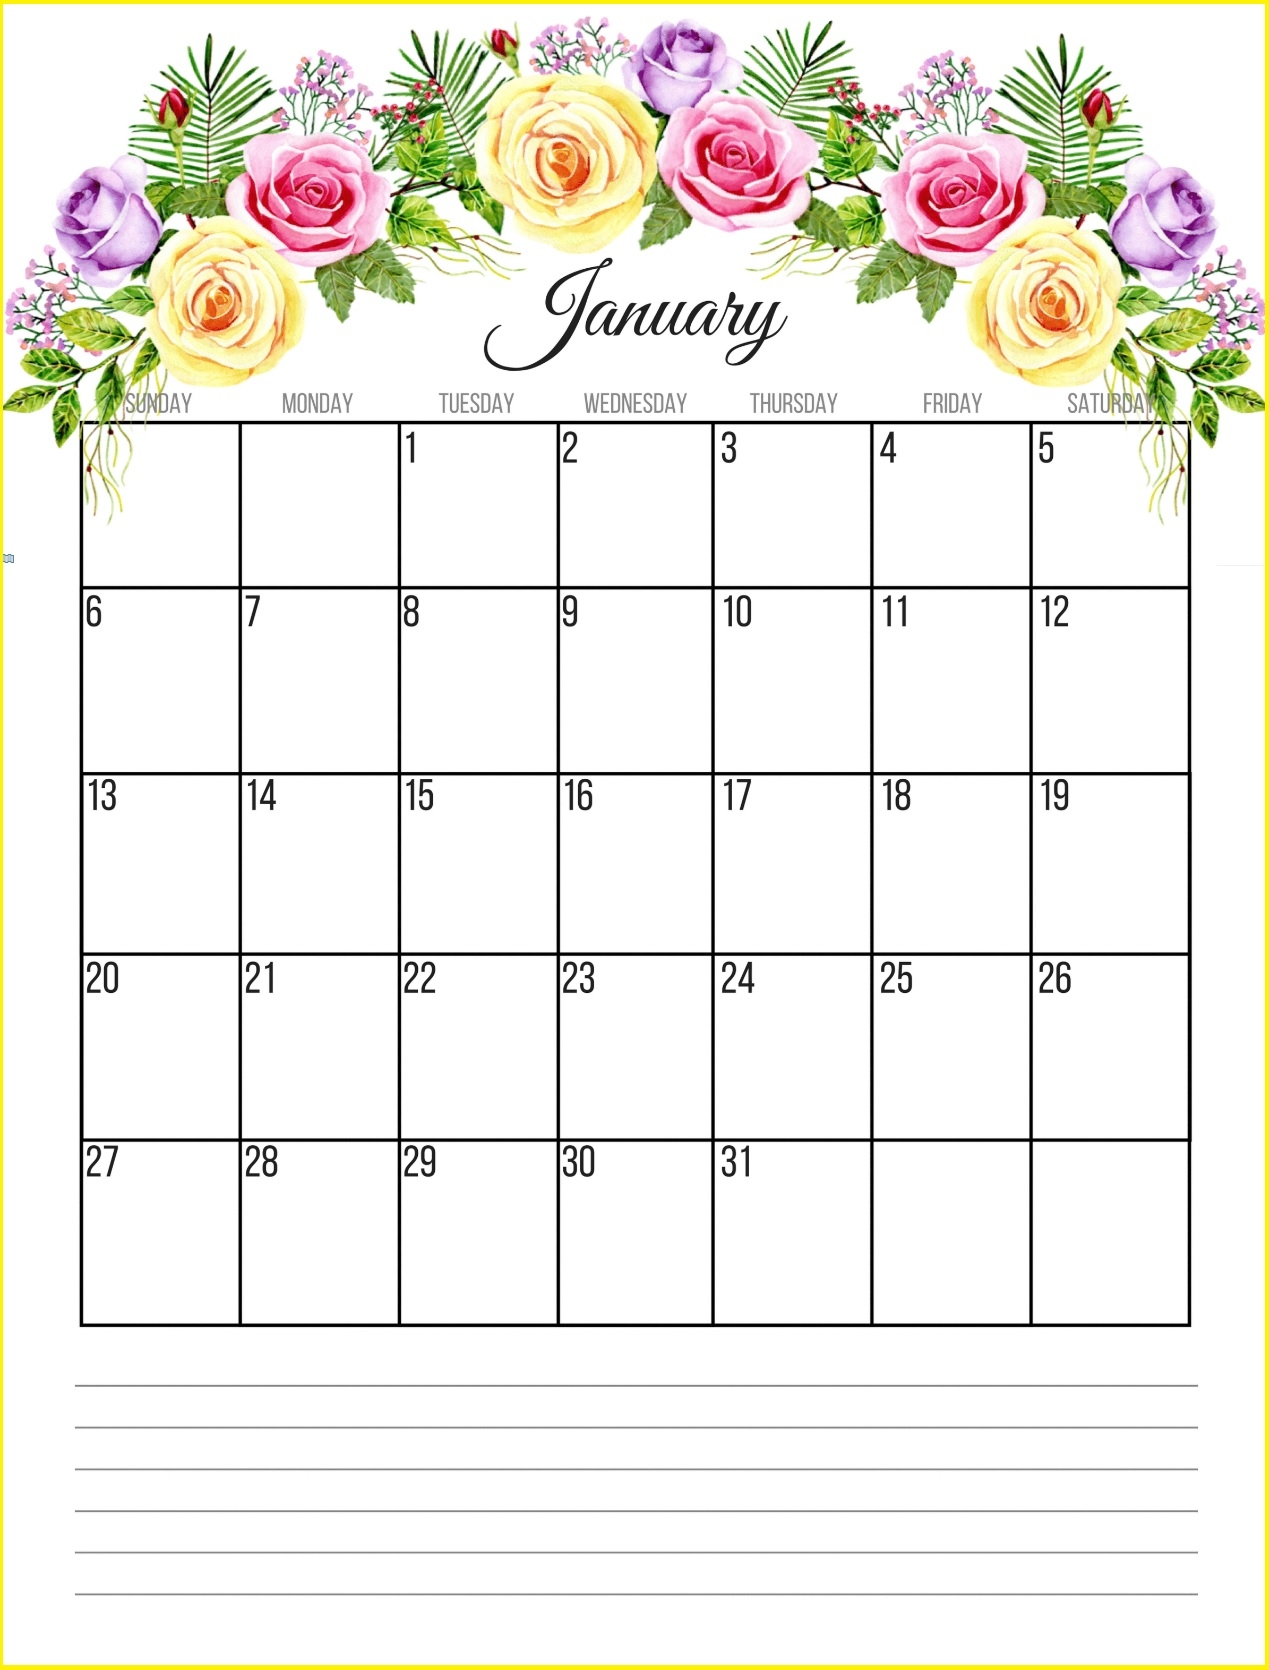 printable floral 2019 monthly calendar calendar 2019::January 2019 Monthly Calendar